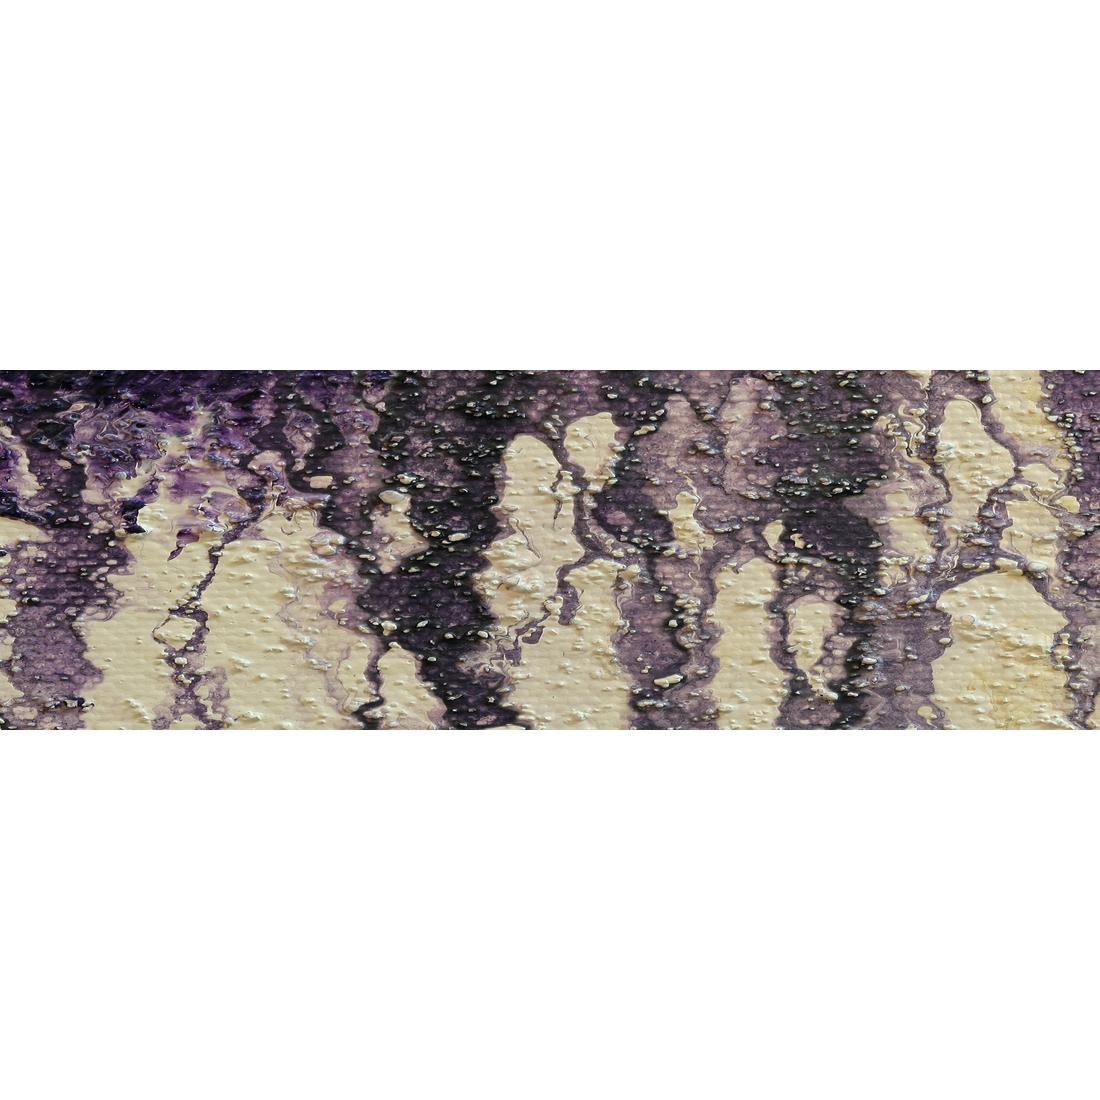 Aubergine Hair (Long) – Canvas Print – Wall Art – Australia With Aubergine Wall Art (Image 4 of 20)